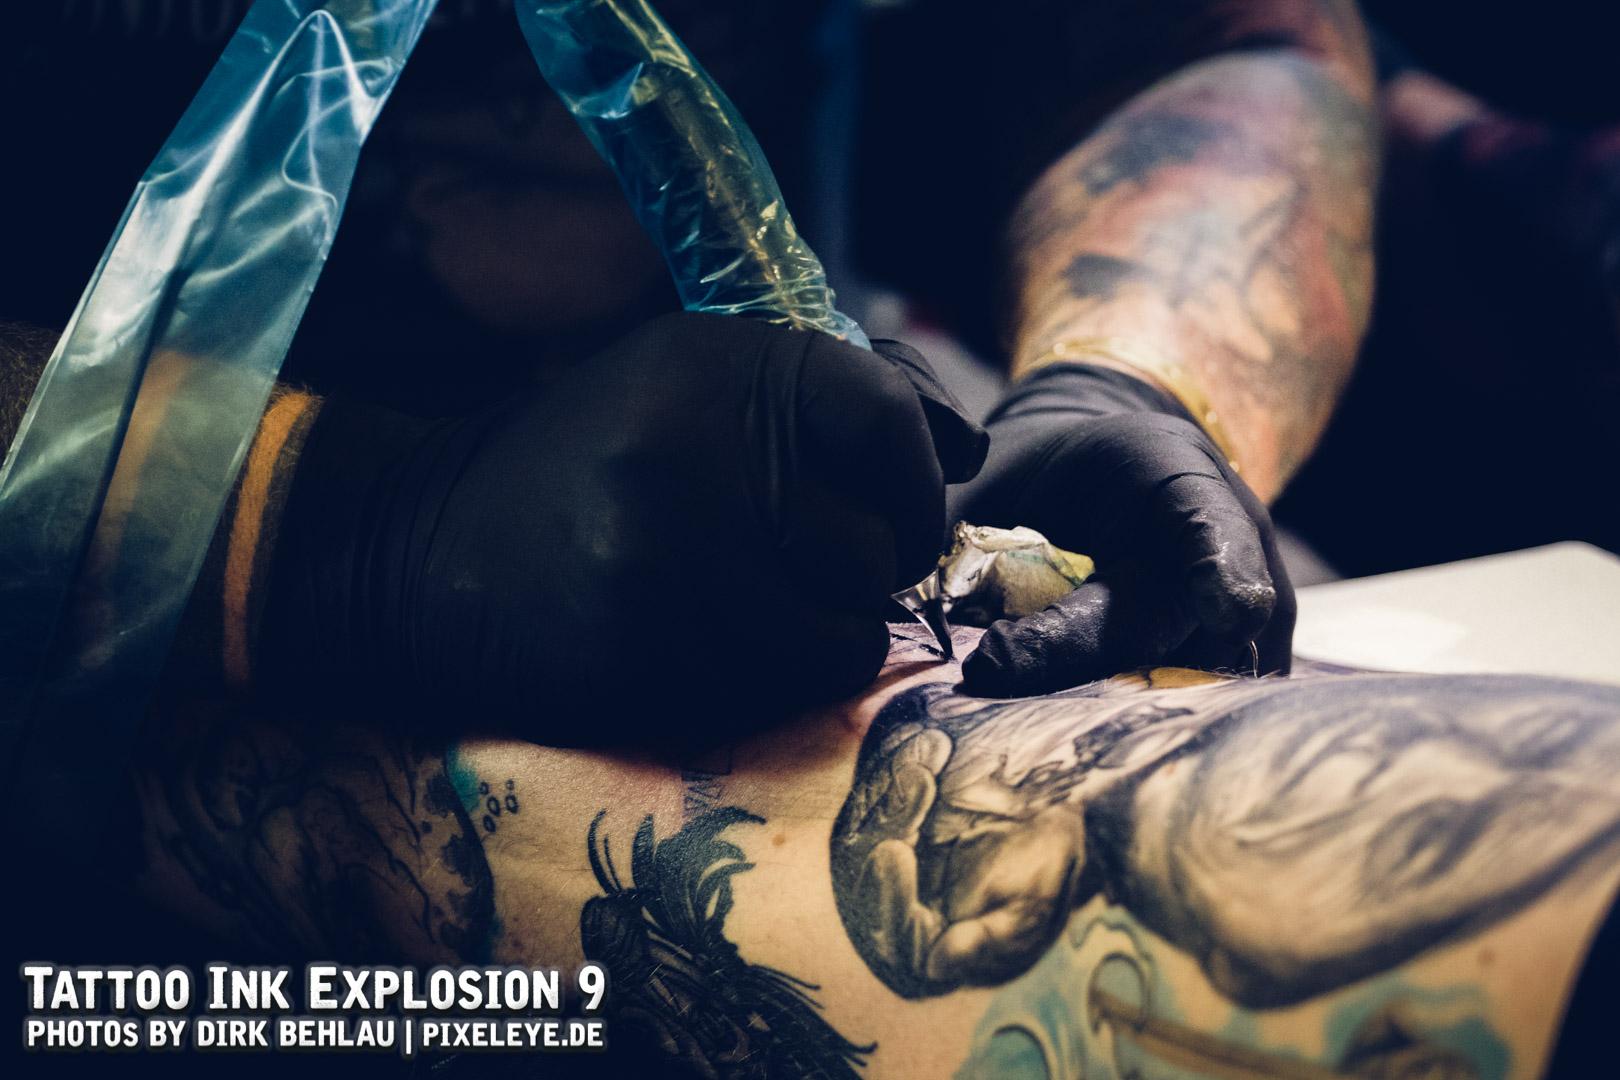 Tattoo Ink Explosion 2018 WEB by Dirk Behlau-1239.jpg